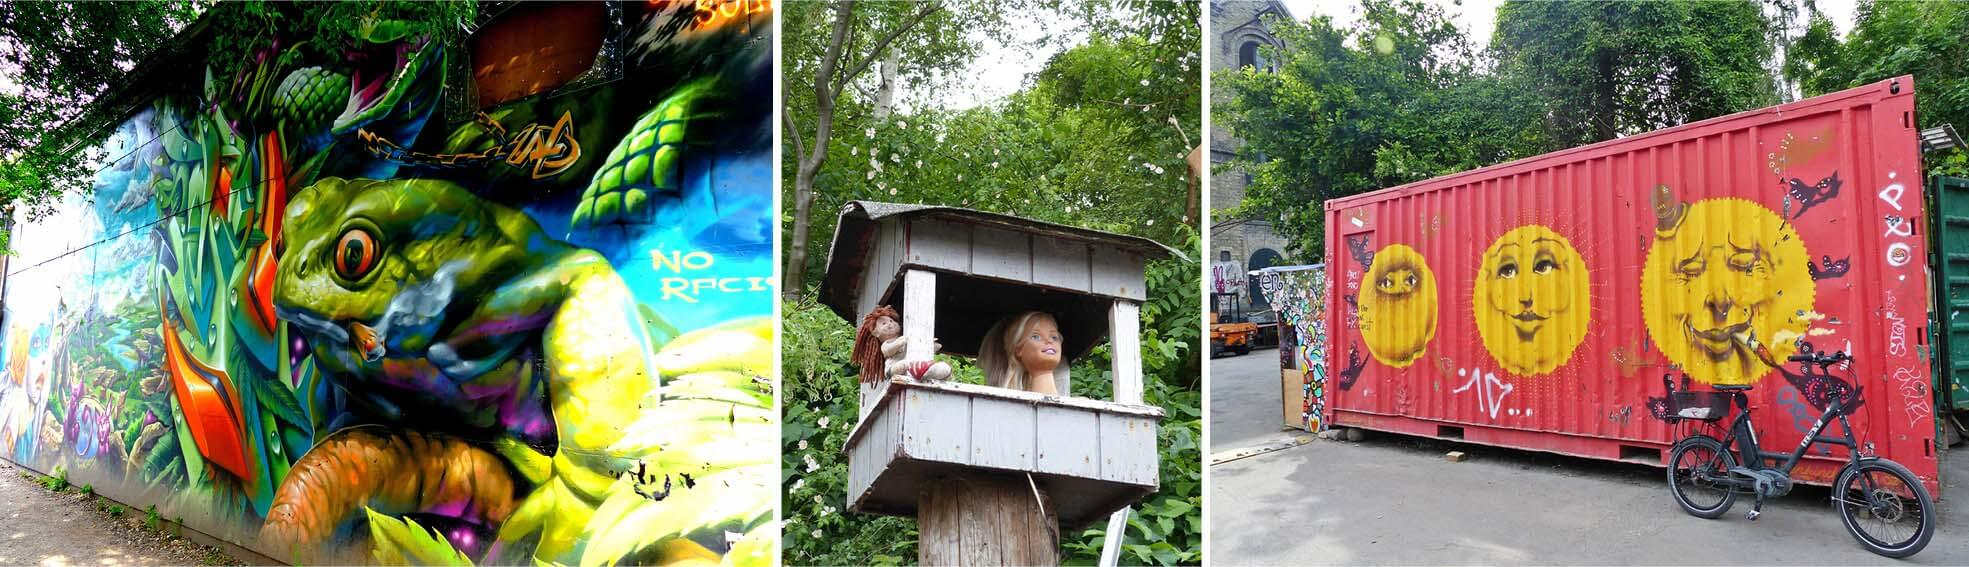 copenhague, danemark, Denmark, voyage, europe, christiania, velos, hippies, street art, art, tag